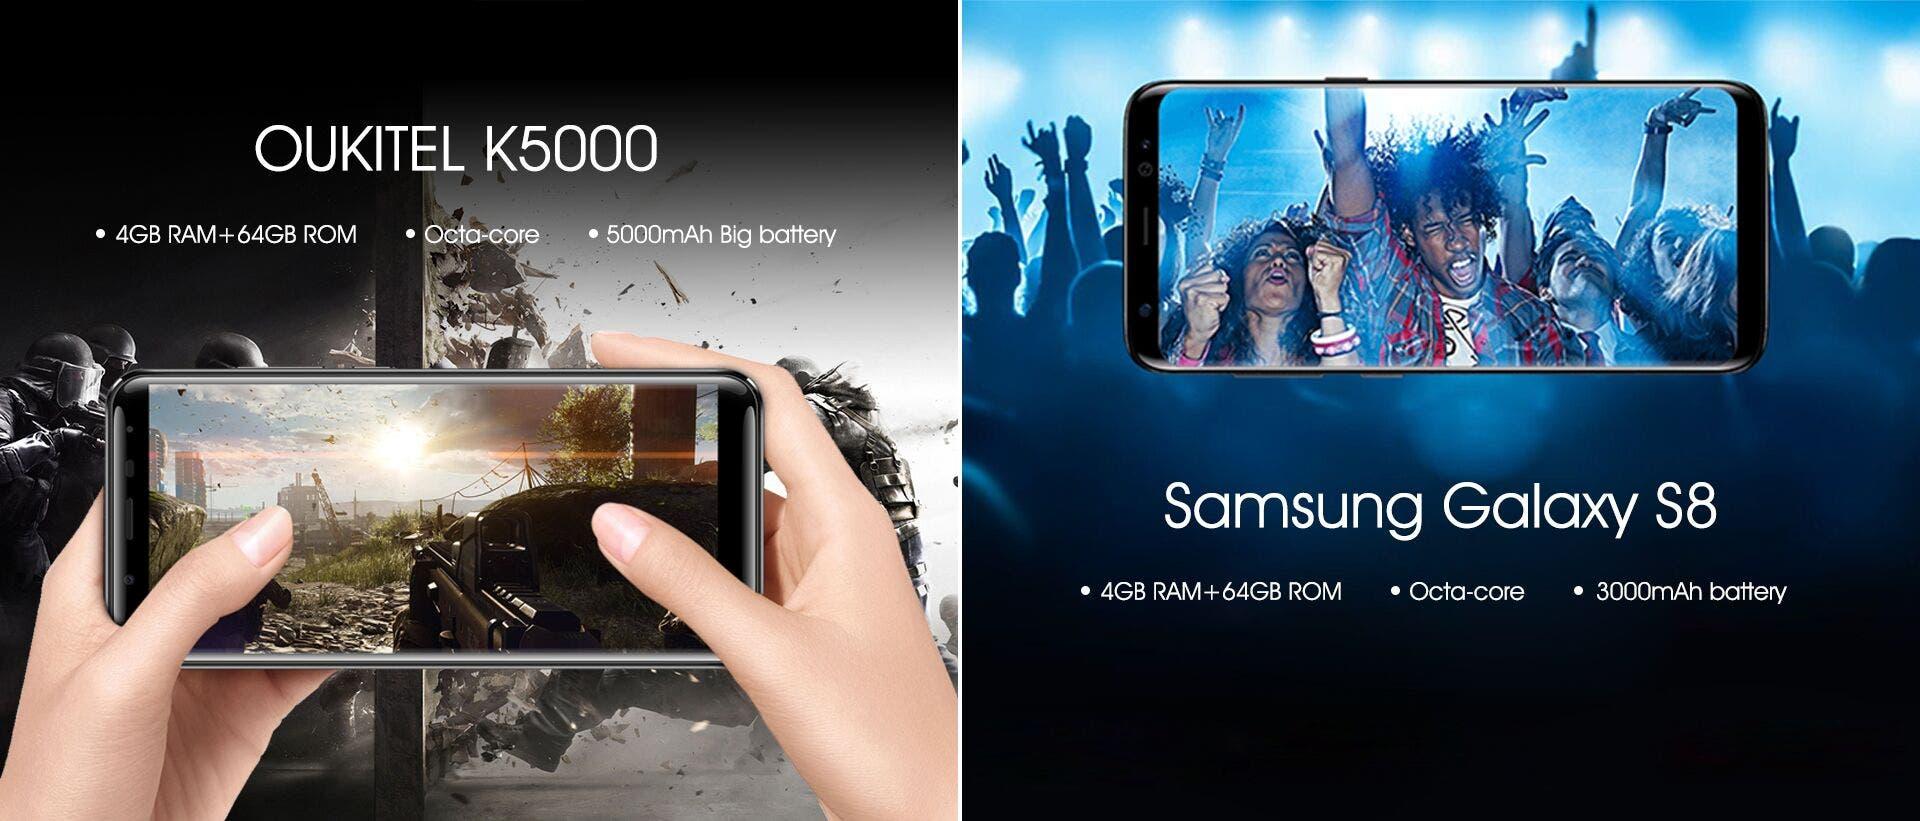 Oukitel K5000 vs Samsung Galaxy S8